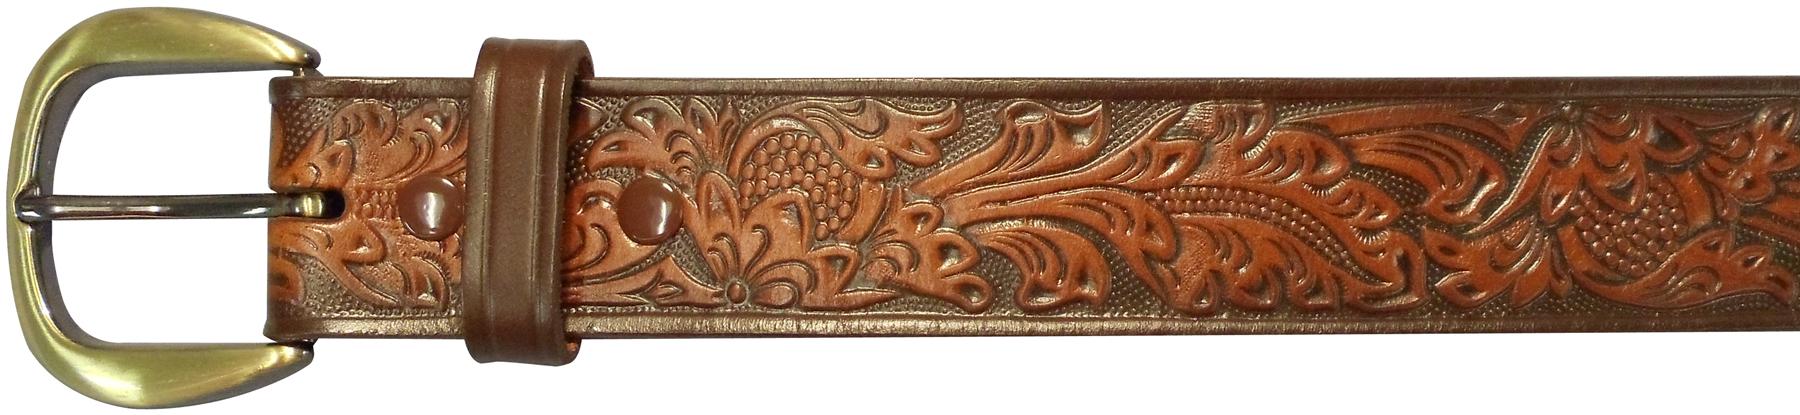 "10610110236 - 36"" Brown Leather Embossed Belt"